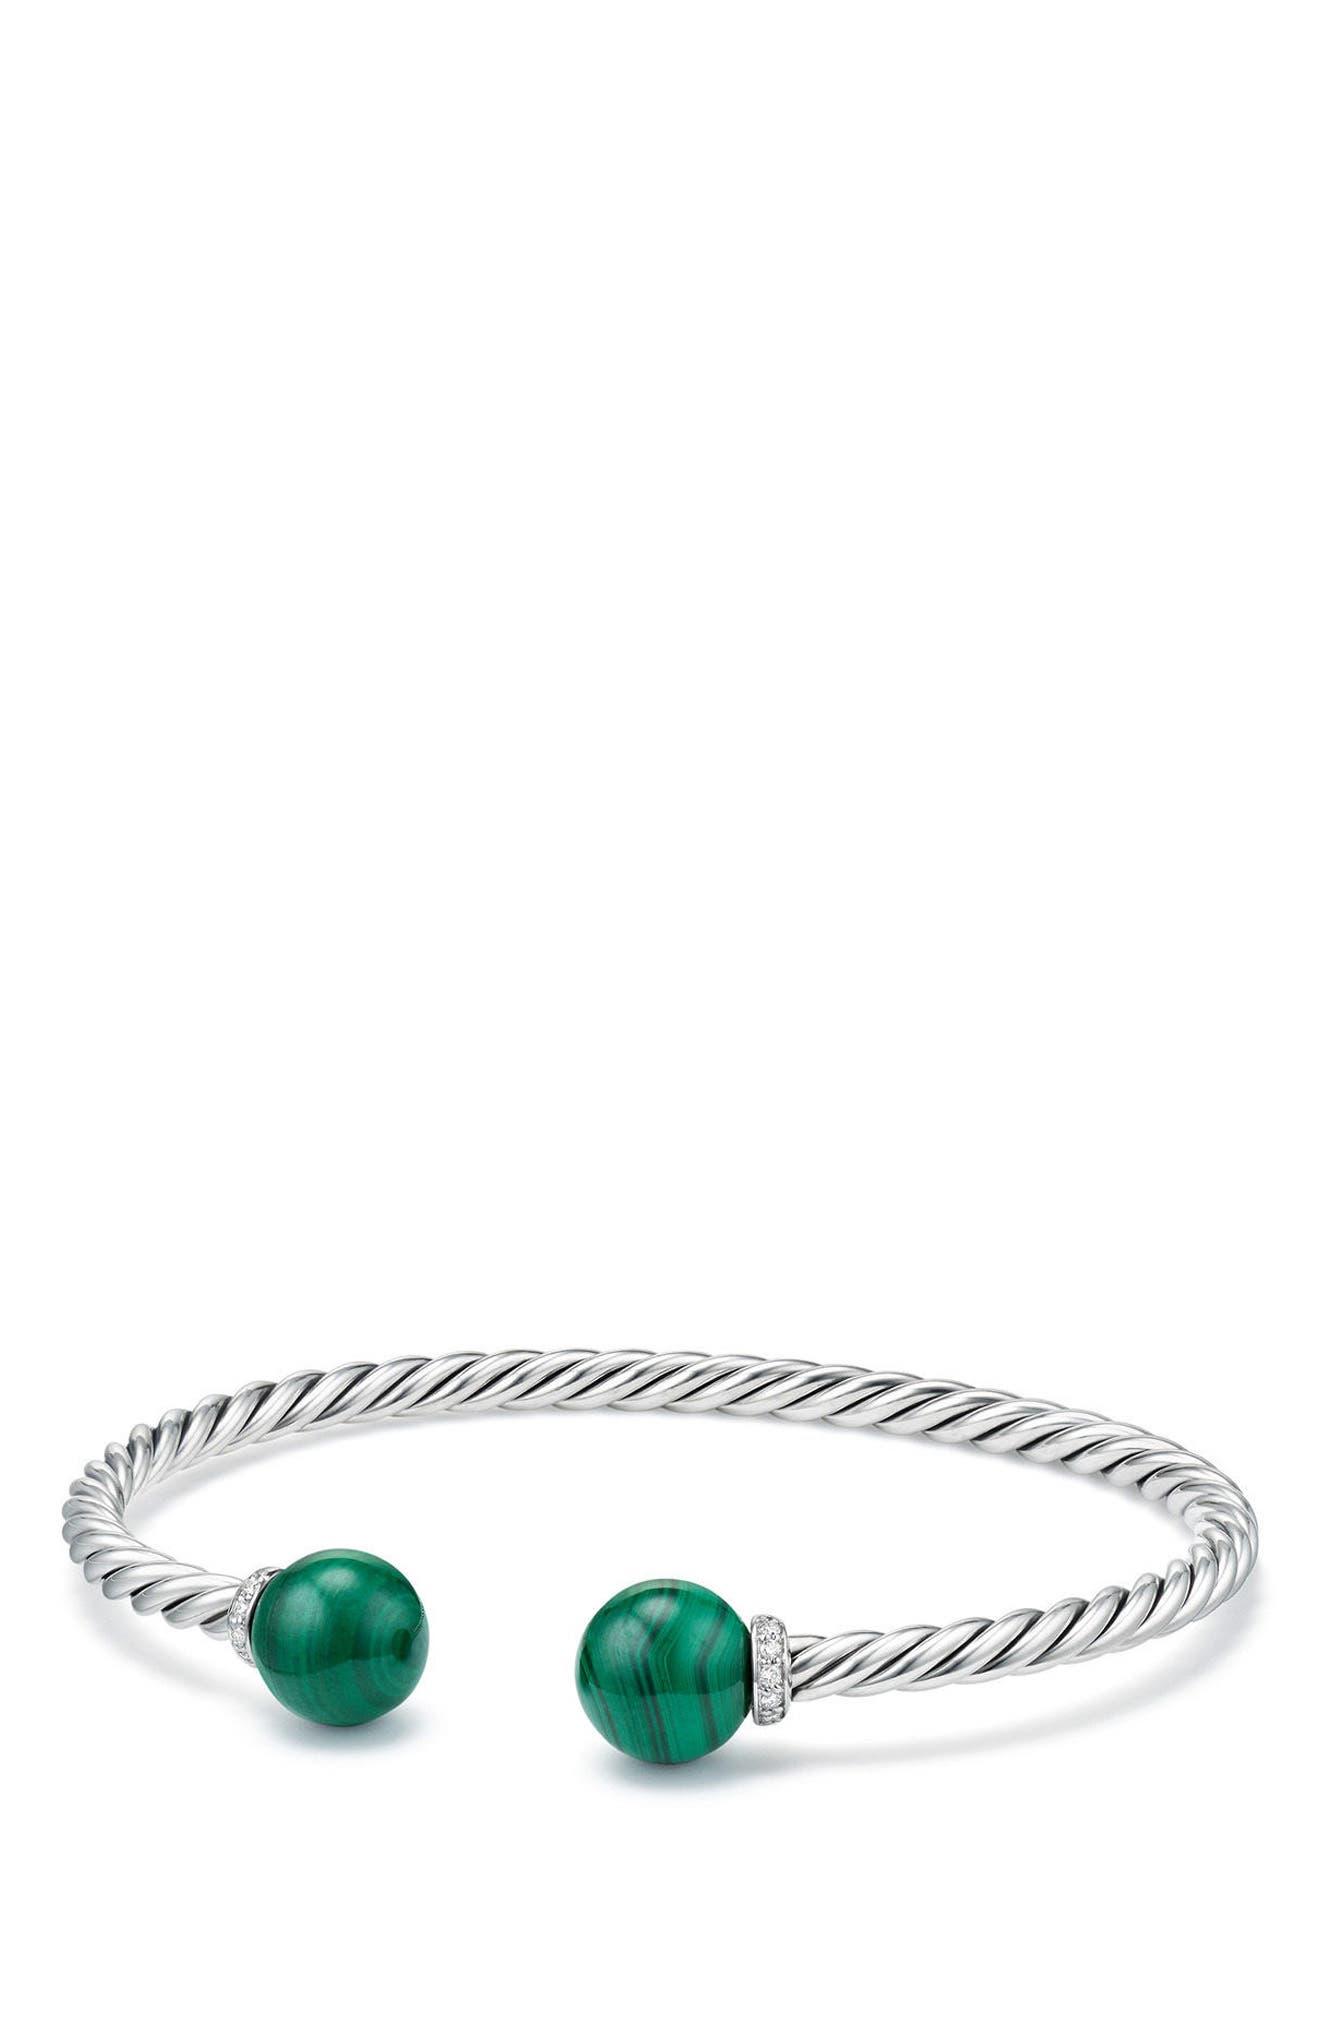 Solari Bead Bracelet with Diamonds,                             Main thumbnail 1, color,                             Silver/ Diamond/ Malachite